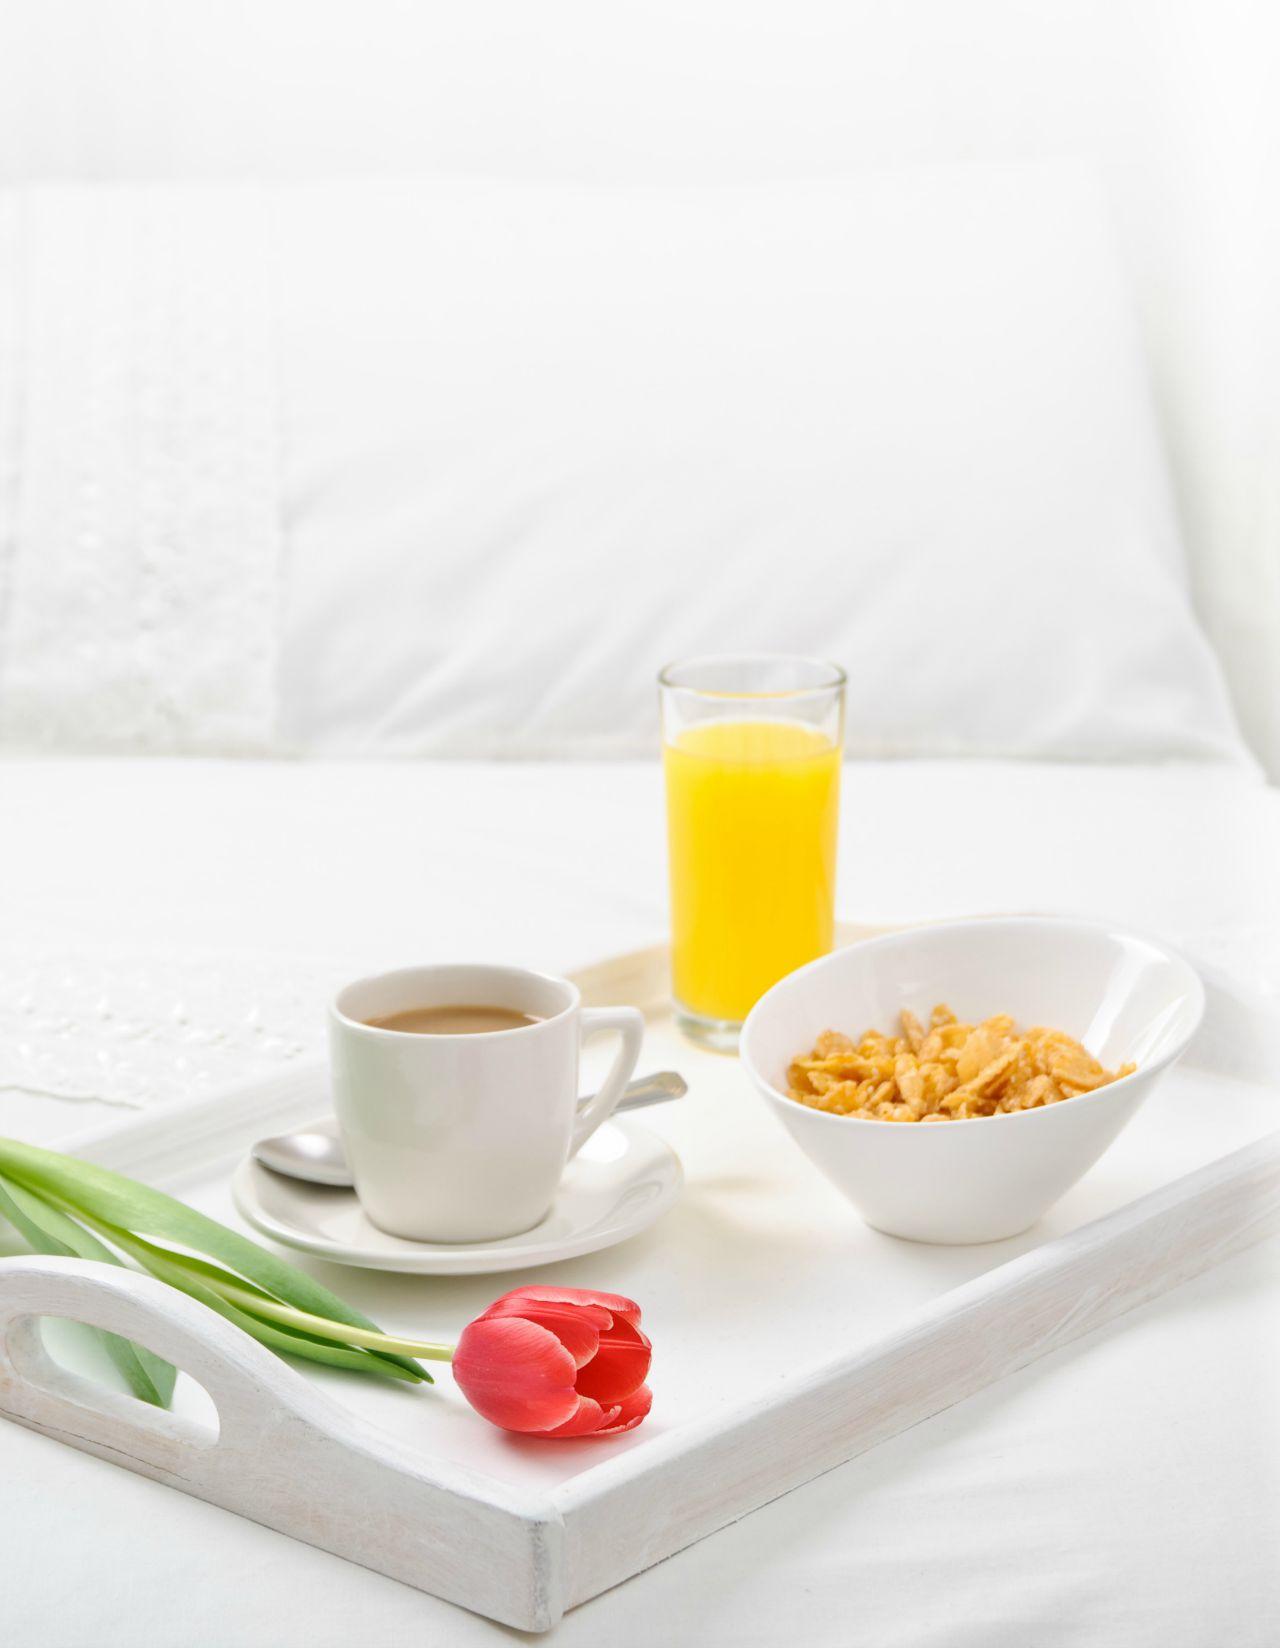 Breakfast tray on bed, high key, shallow dof